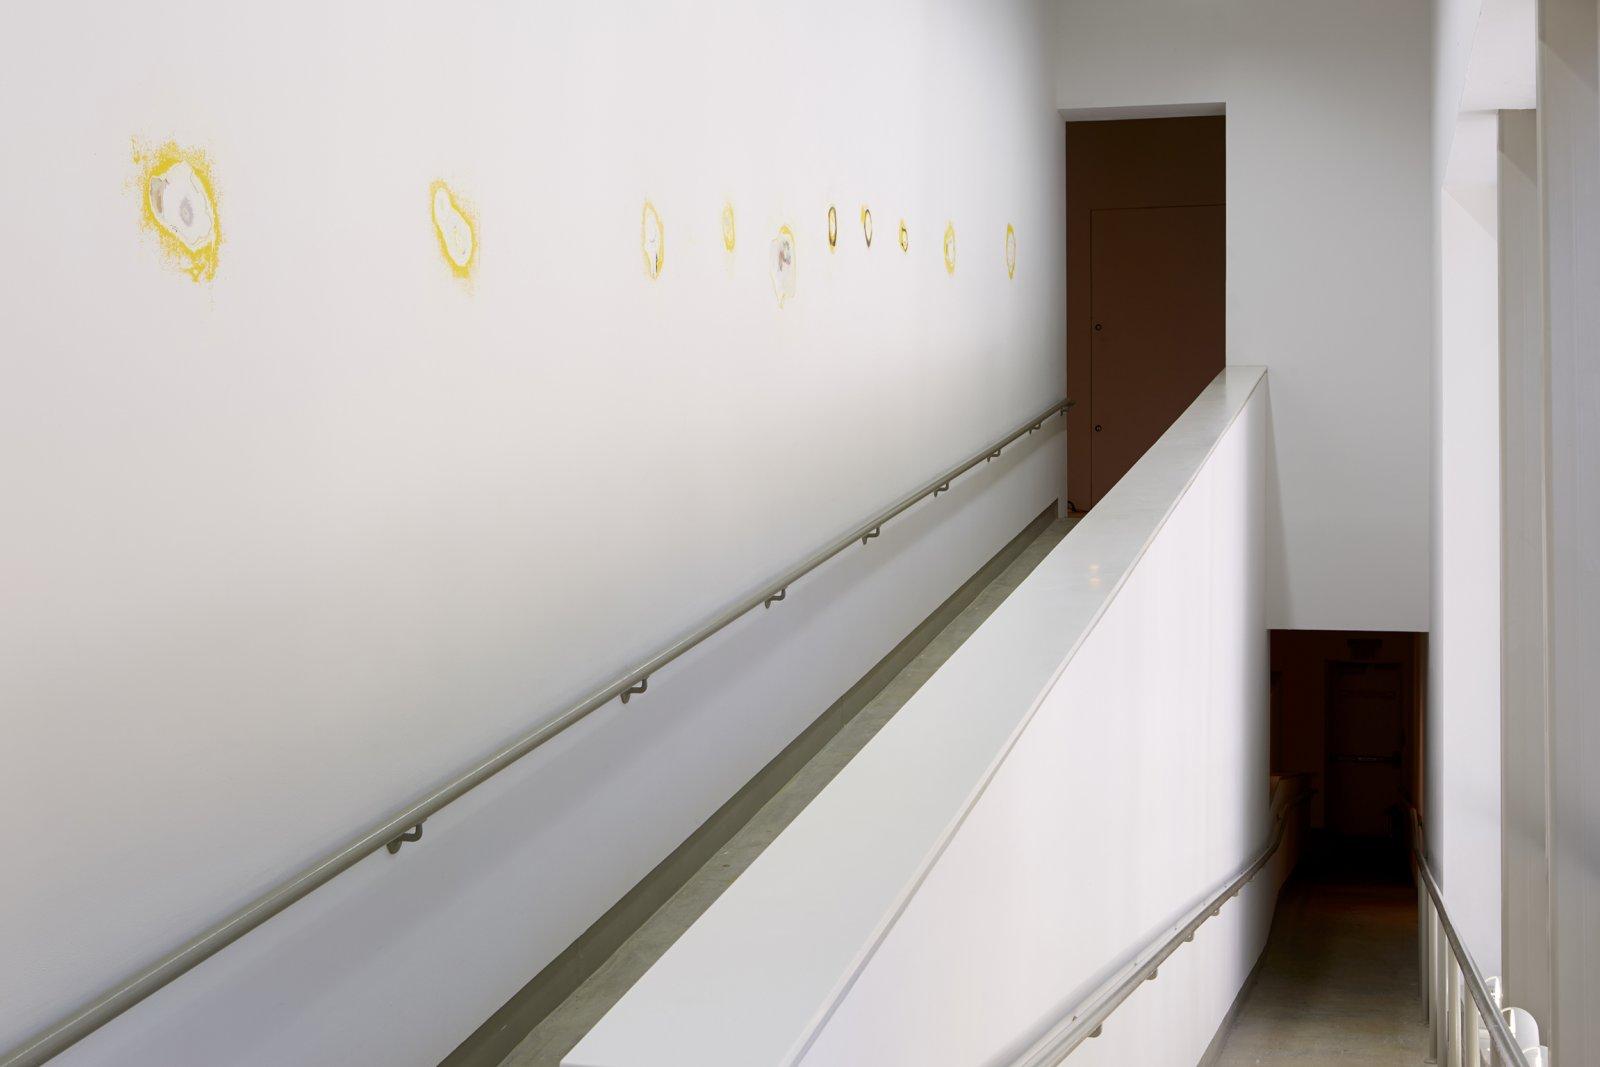 Duane Linklater, installation view, It means it is raining, ICA, Philadelphia, 2014 by Duane Linklater